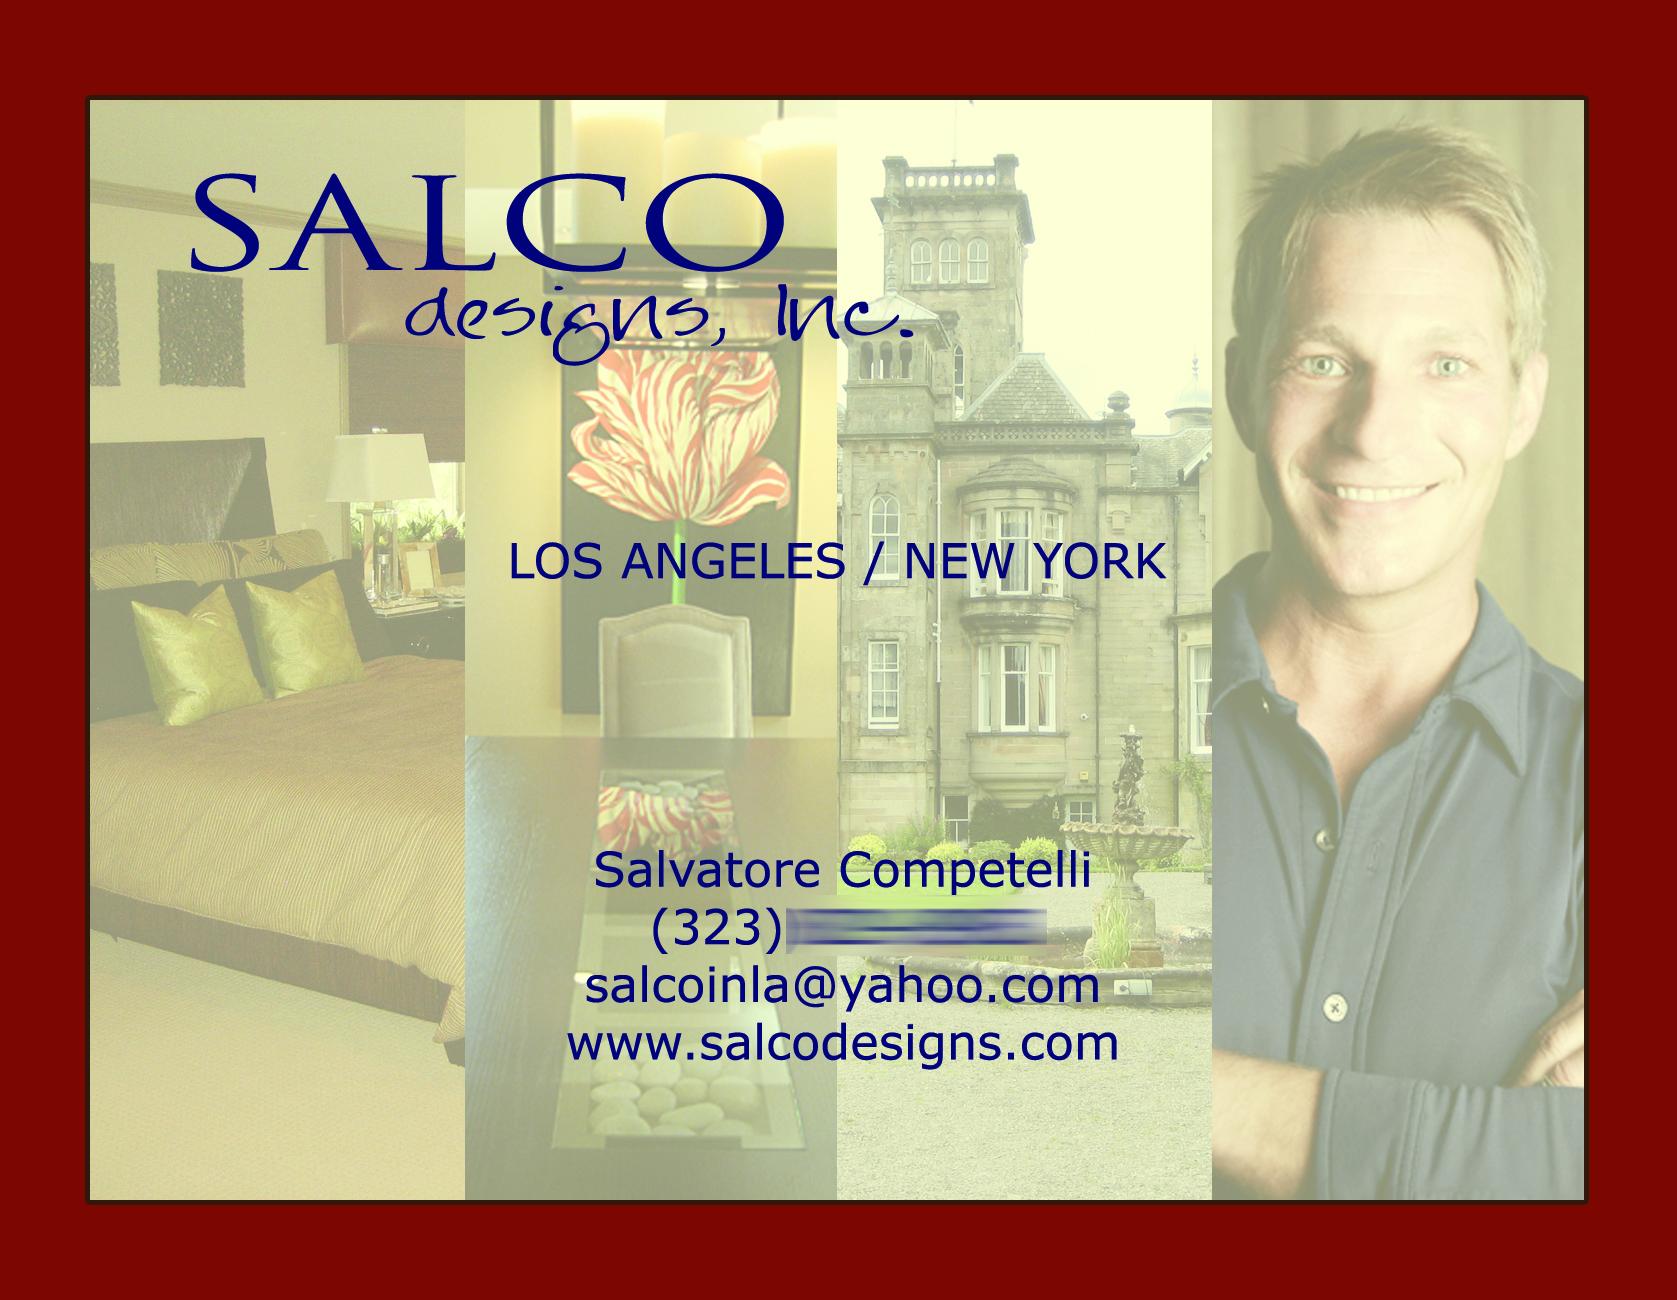 SalcoDesignsPostcard